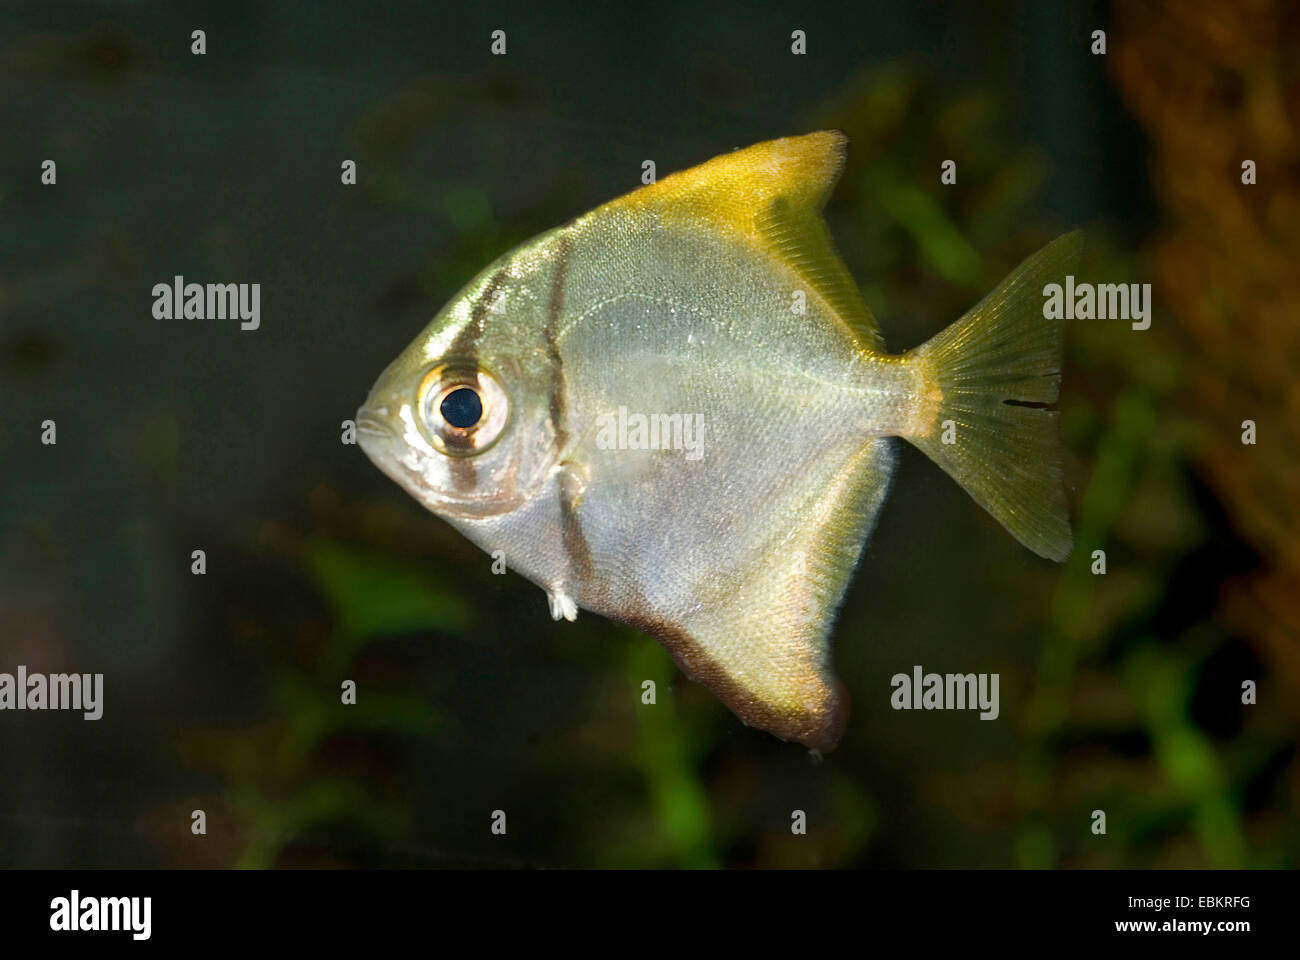 silver mono, moonfish, diamondfish, fingerfish, kilefish, butter-bream, silver moony (Monodactylus argenteus), swimming - Stock Image